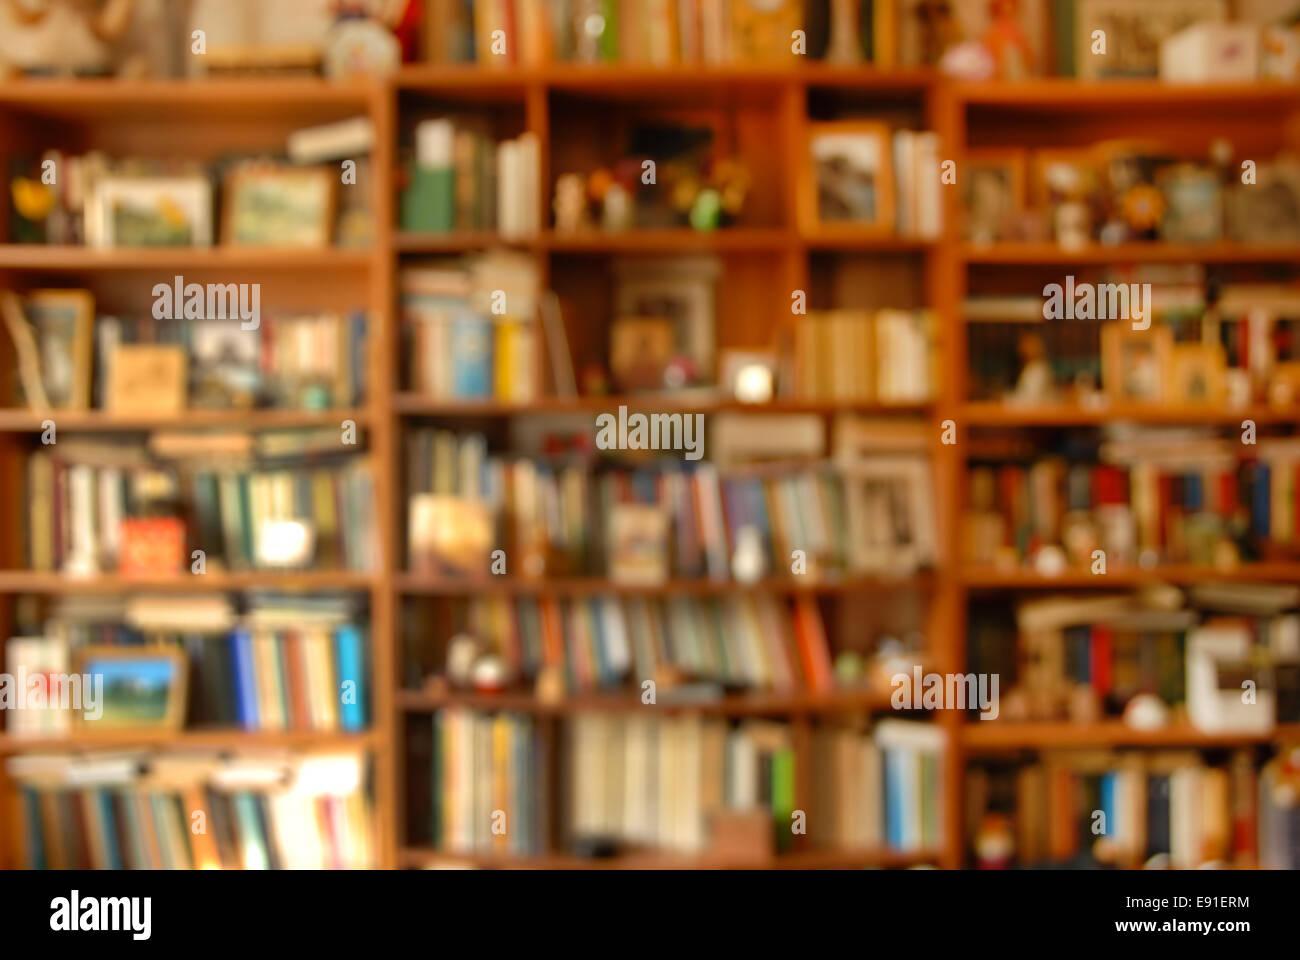 Book shelves - Stock Image